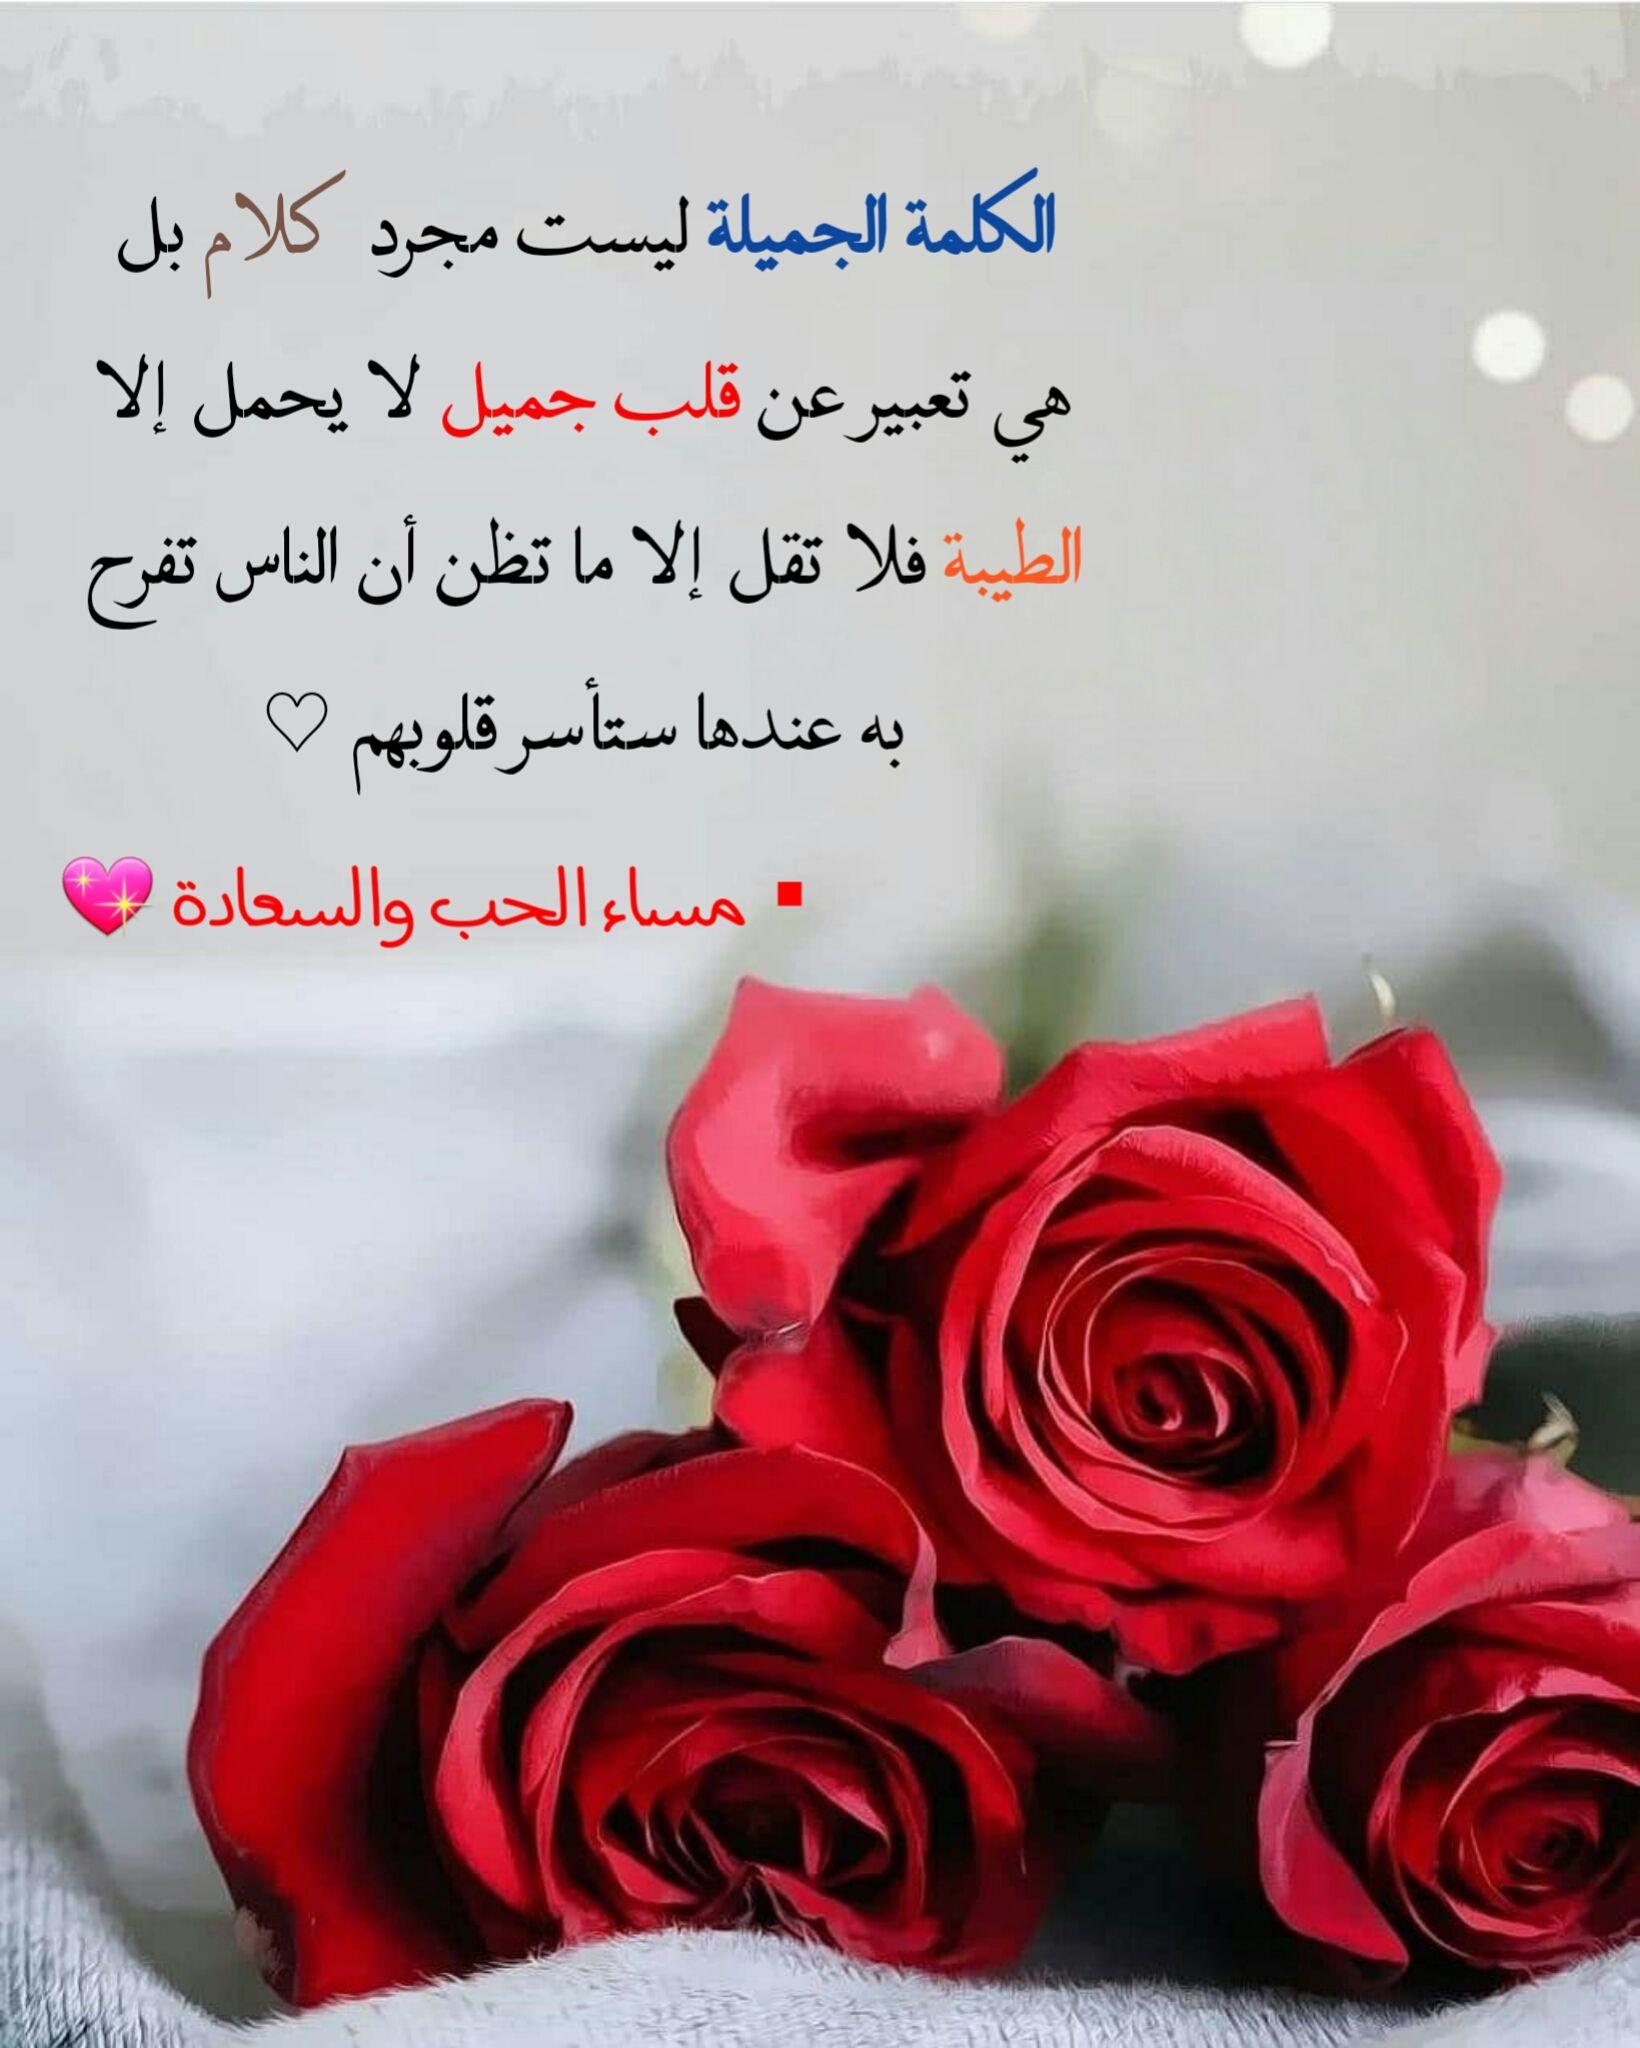 Pin By Rami R Rmlawi On كلمات Words Good Morning Flowers Good Morning Photos Morning Flowers